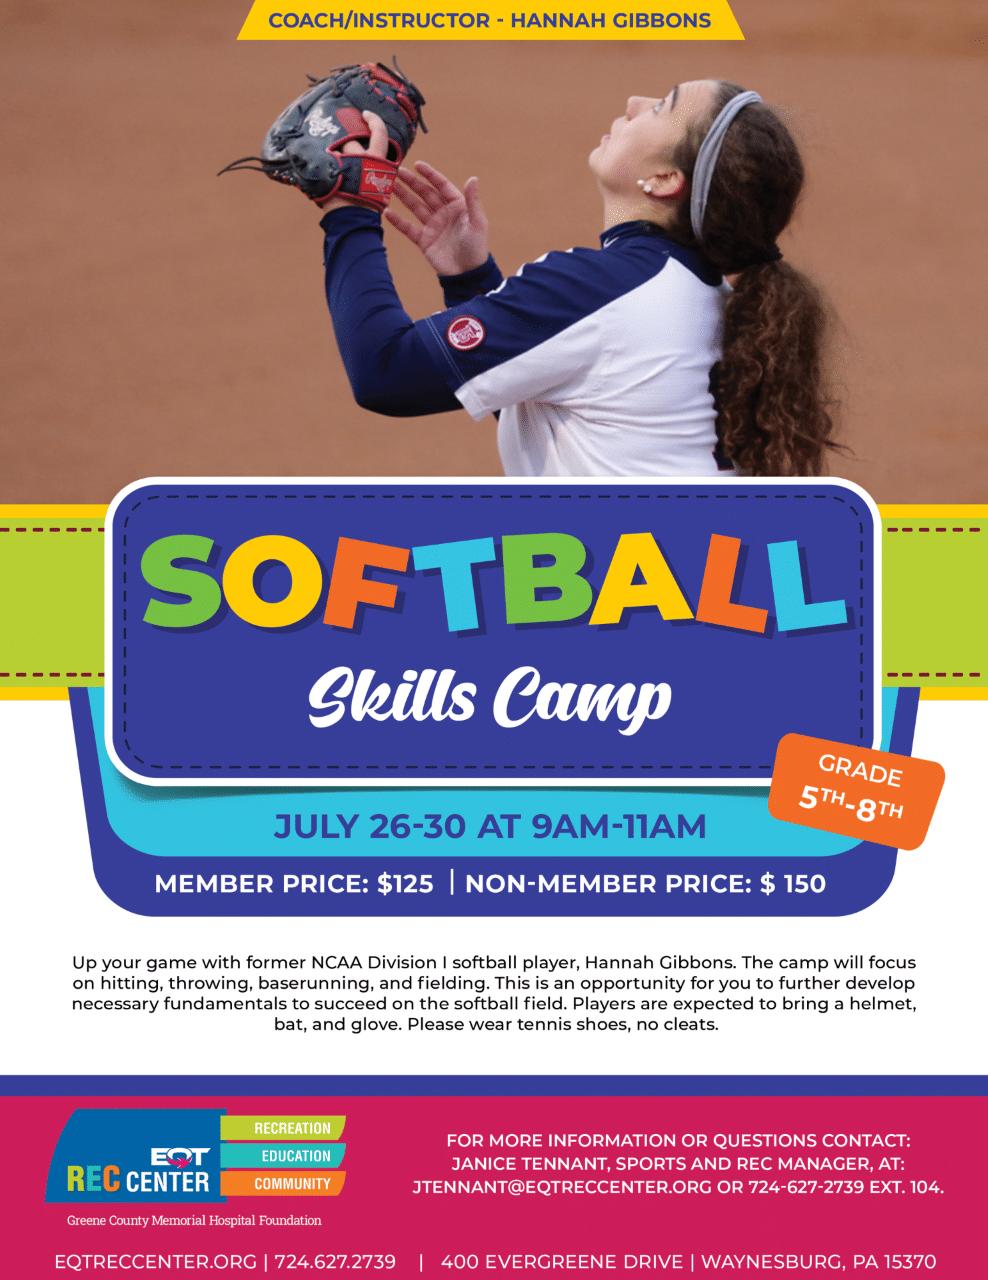 Softball Skills Camp EQT REC Center Summer Sports Camp